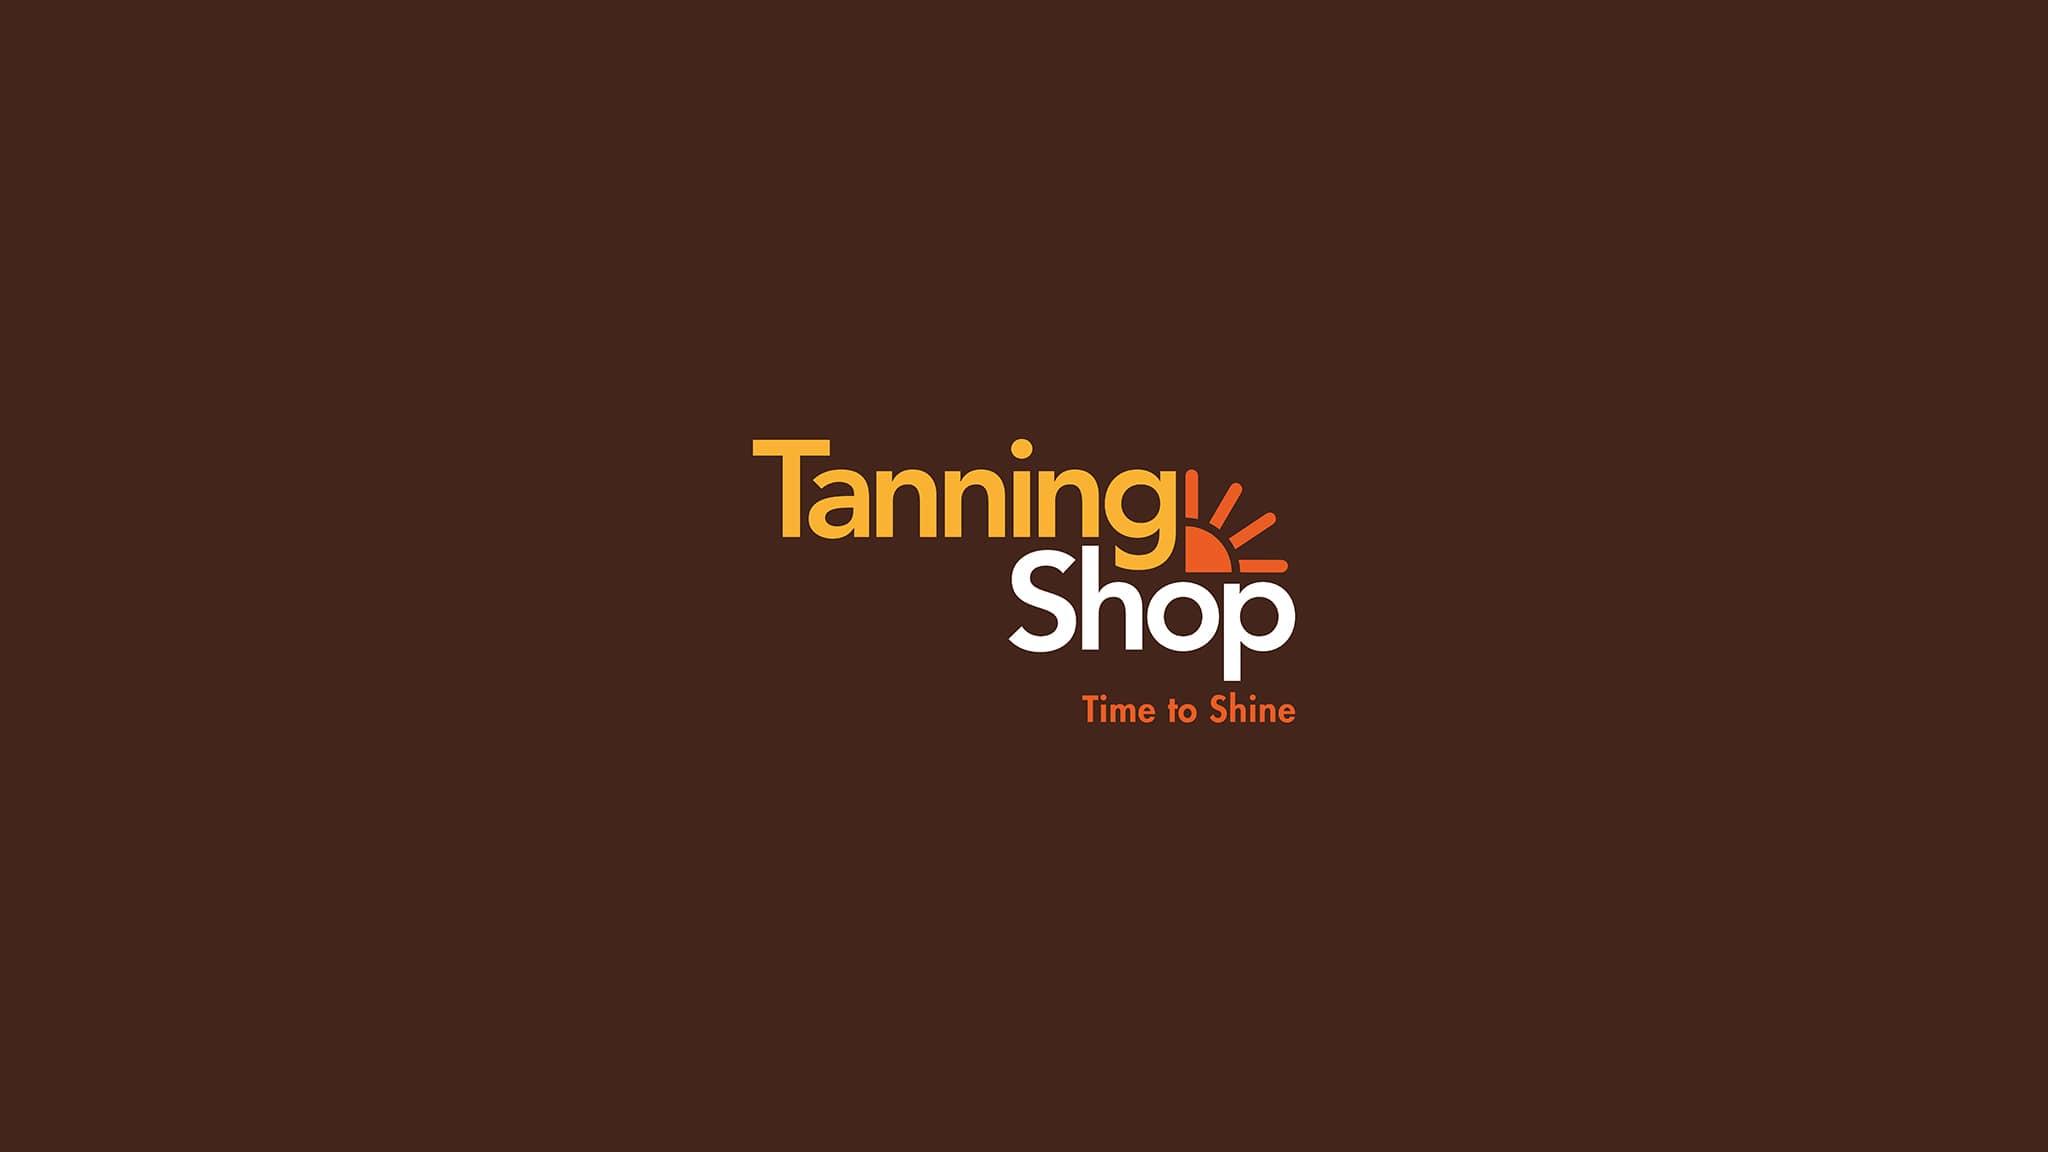 Tanning Shop Middlesbrough